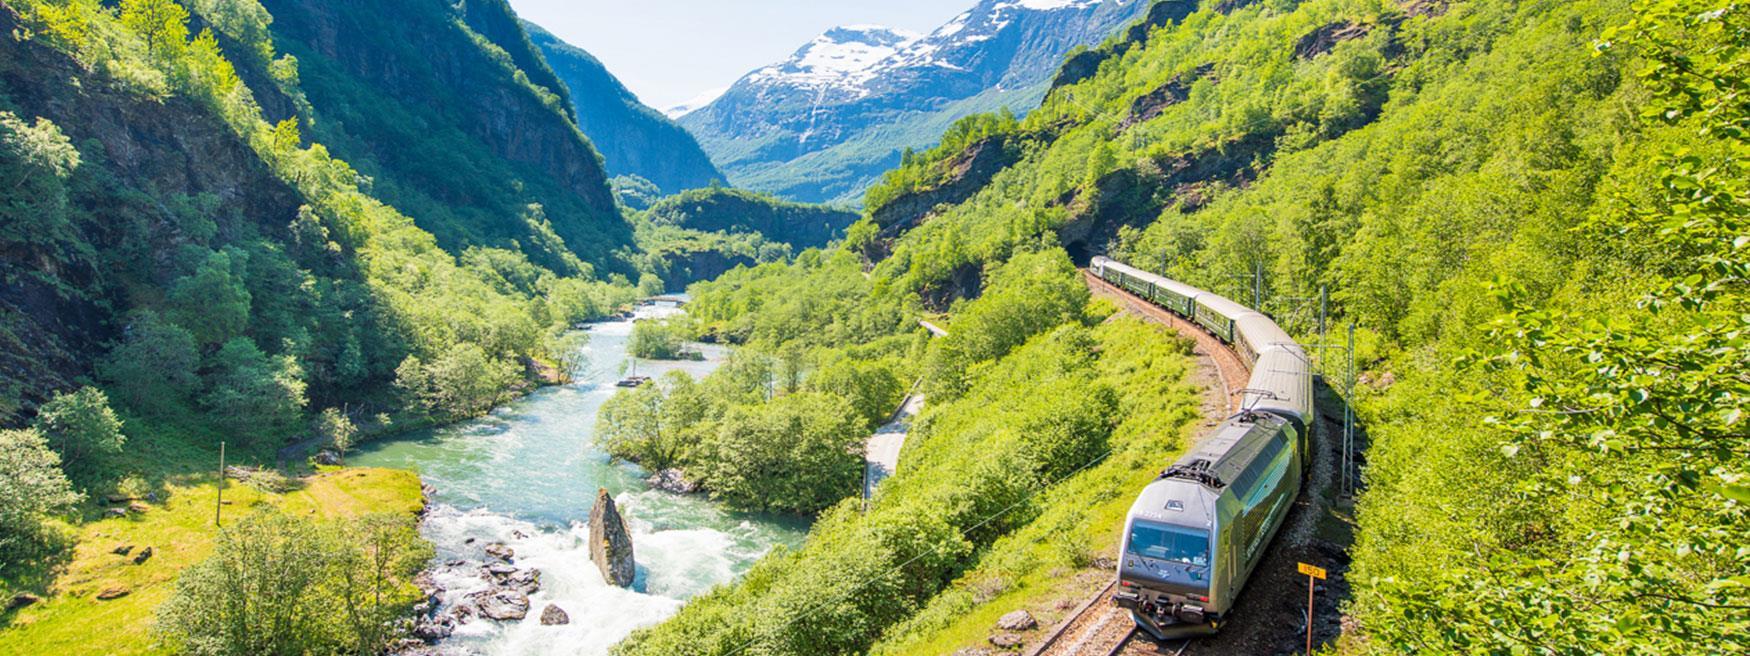 The Flam Railway © Sverre Hjørnevik